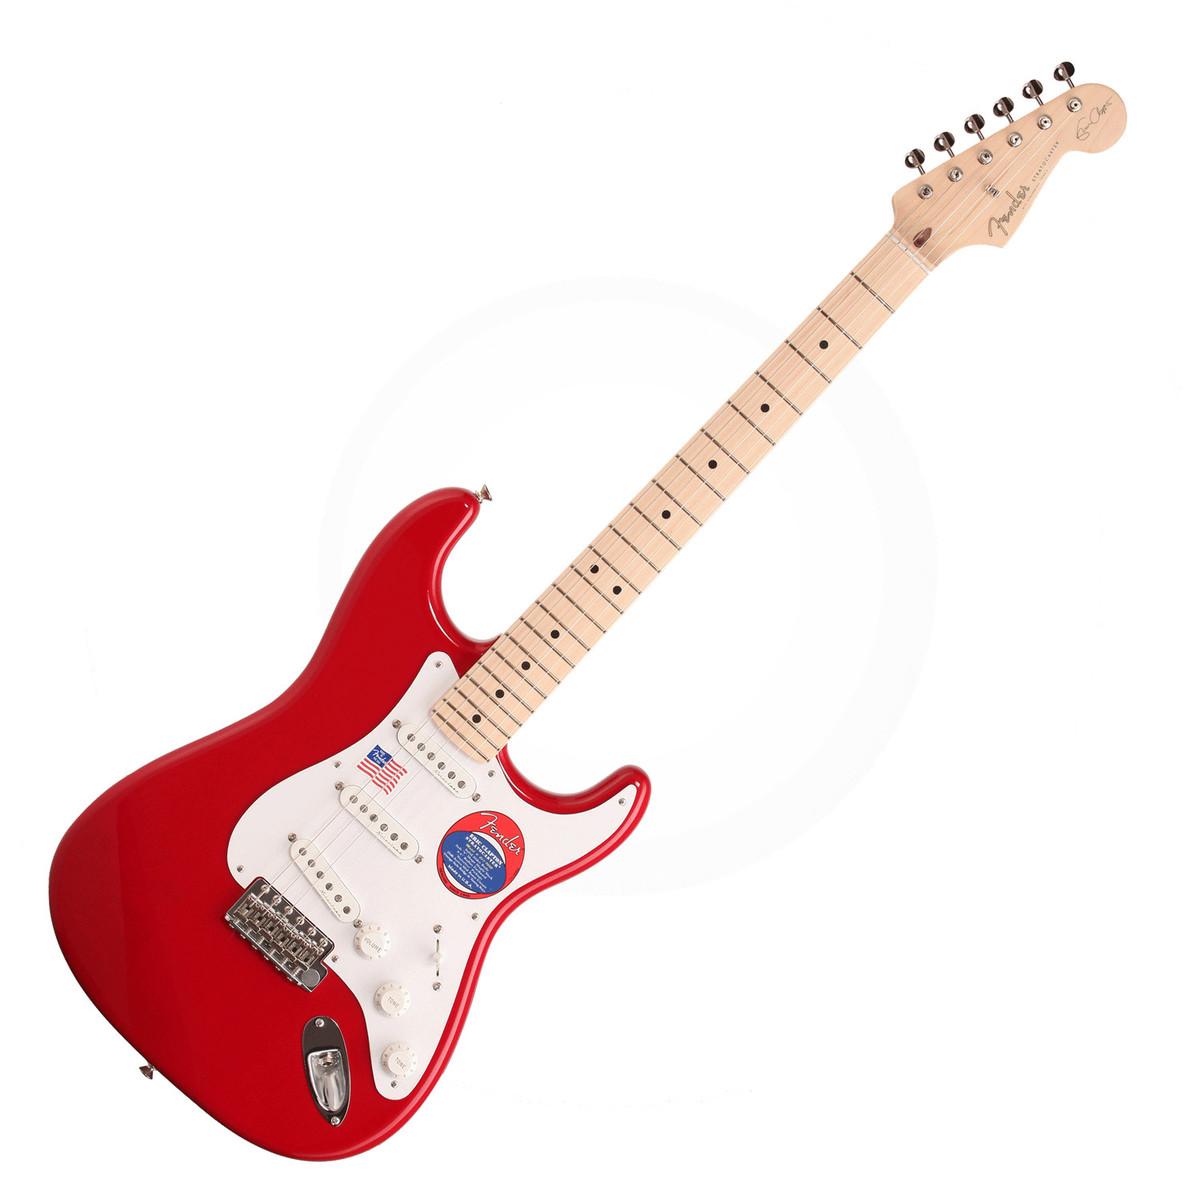 fender eric clapton stratocaster electric guitar mn torino red at. Black Bedroom Furniture Sets. Home Design Ideas